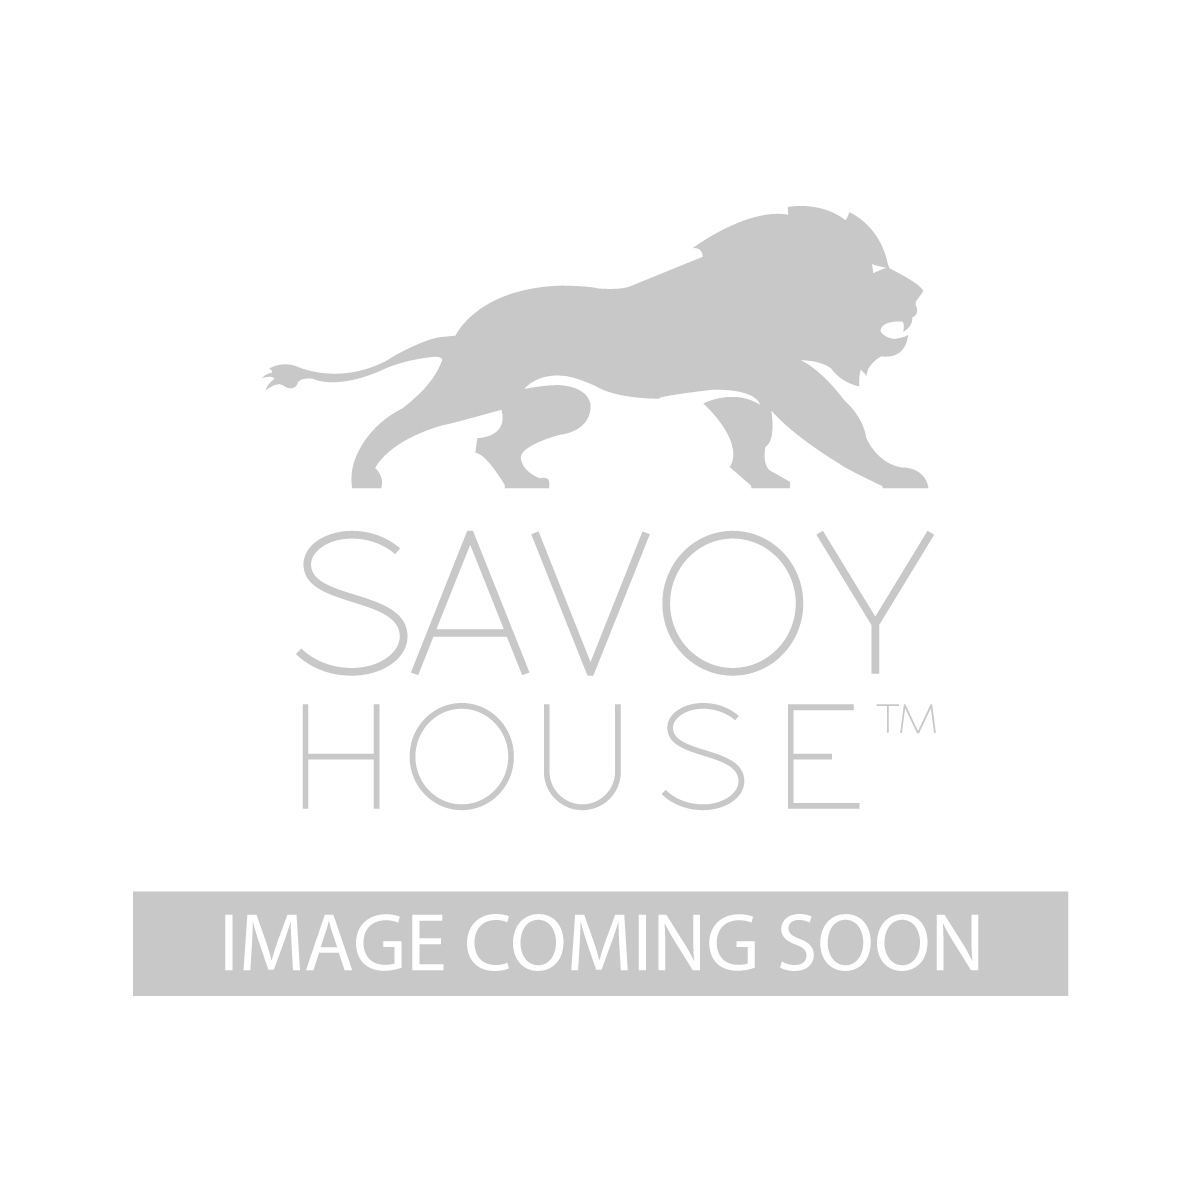 1 7002 3 109 lyrique 3 light chandelier by savoy house lyrique 3 light chandelier arubaitofo Images